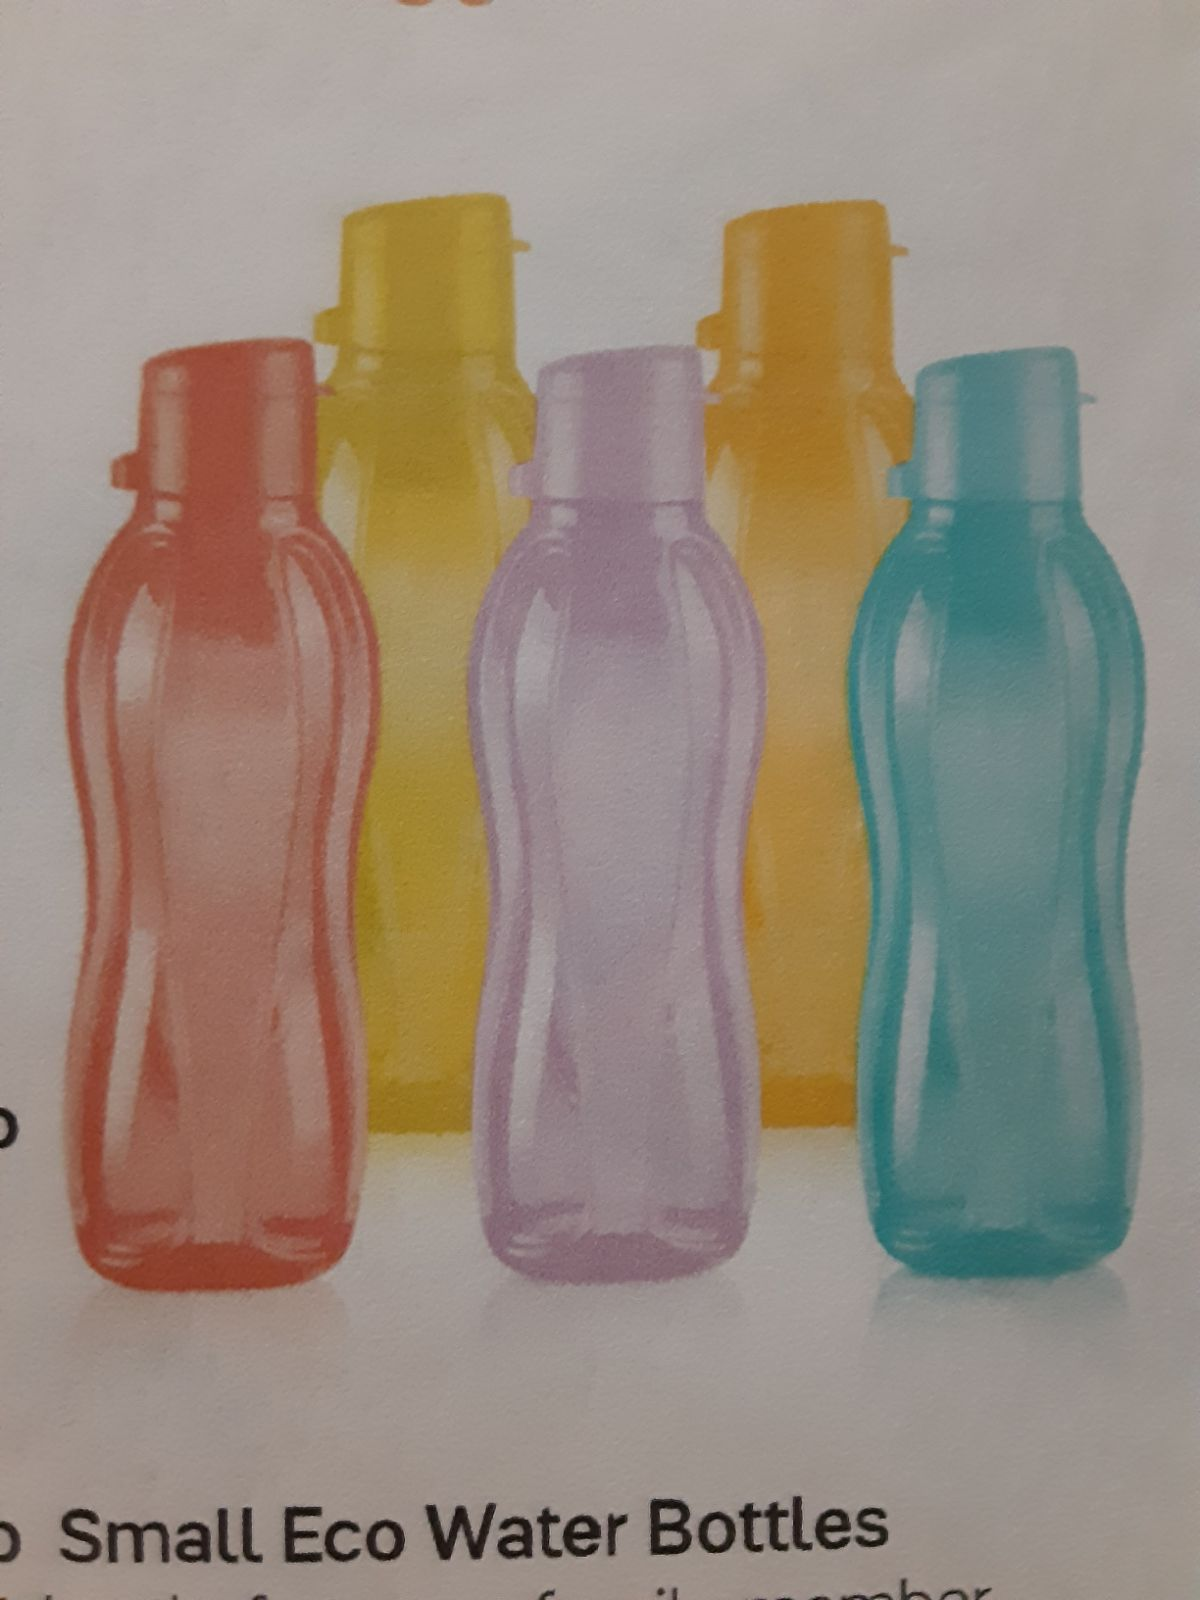 Set of 5 Tupperware eco water bottles.